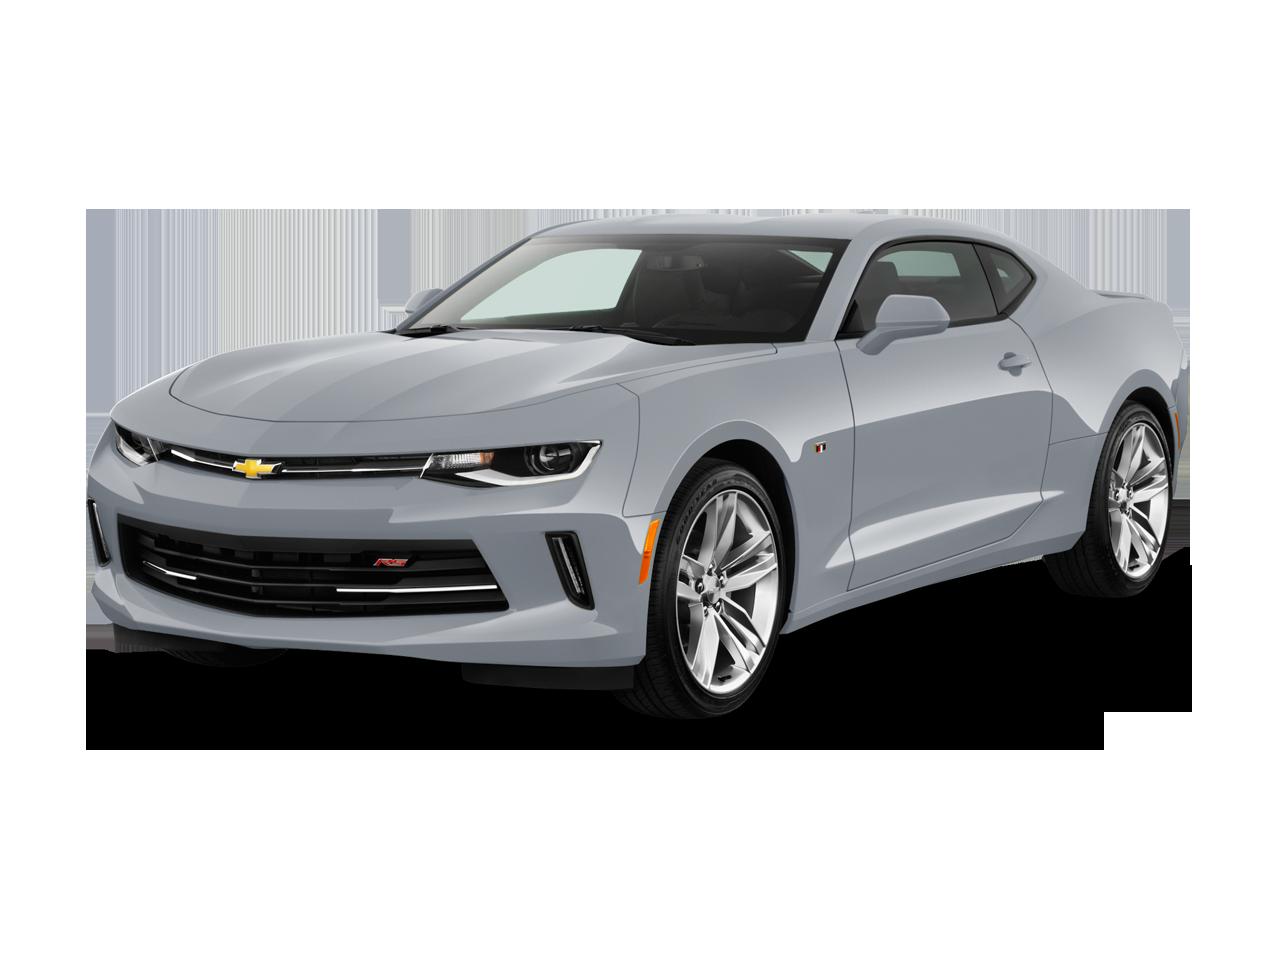 New 2017 Chevrolet Camaro 1lt Near Selma Ca Selma Auto